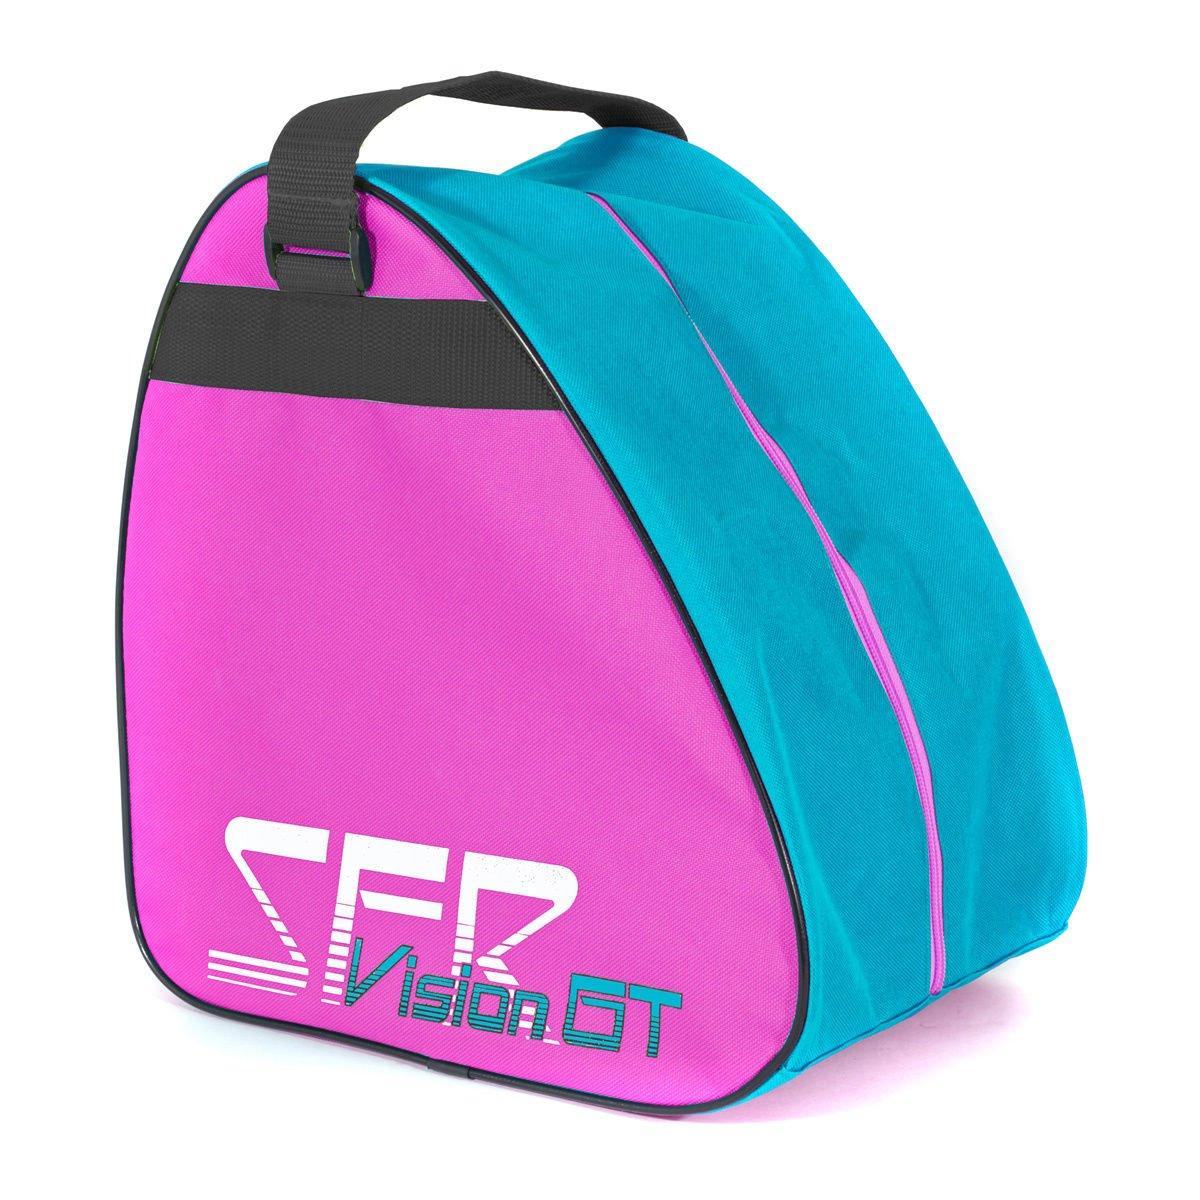 Sfr Skates Vision Bag, Bolsa de Tela y de Playa Unisex Adulto, (Gris), 24x15x45 cm (W x H x L) BAG001